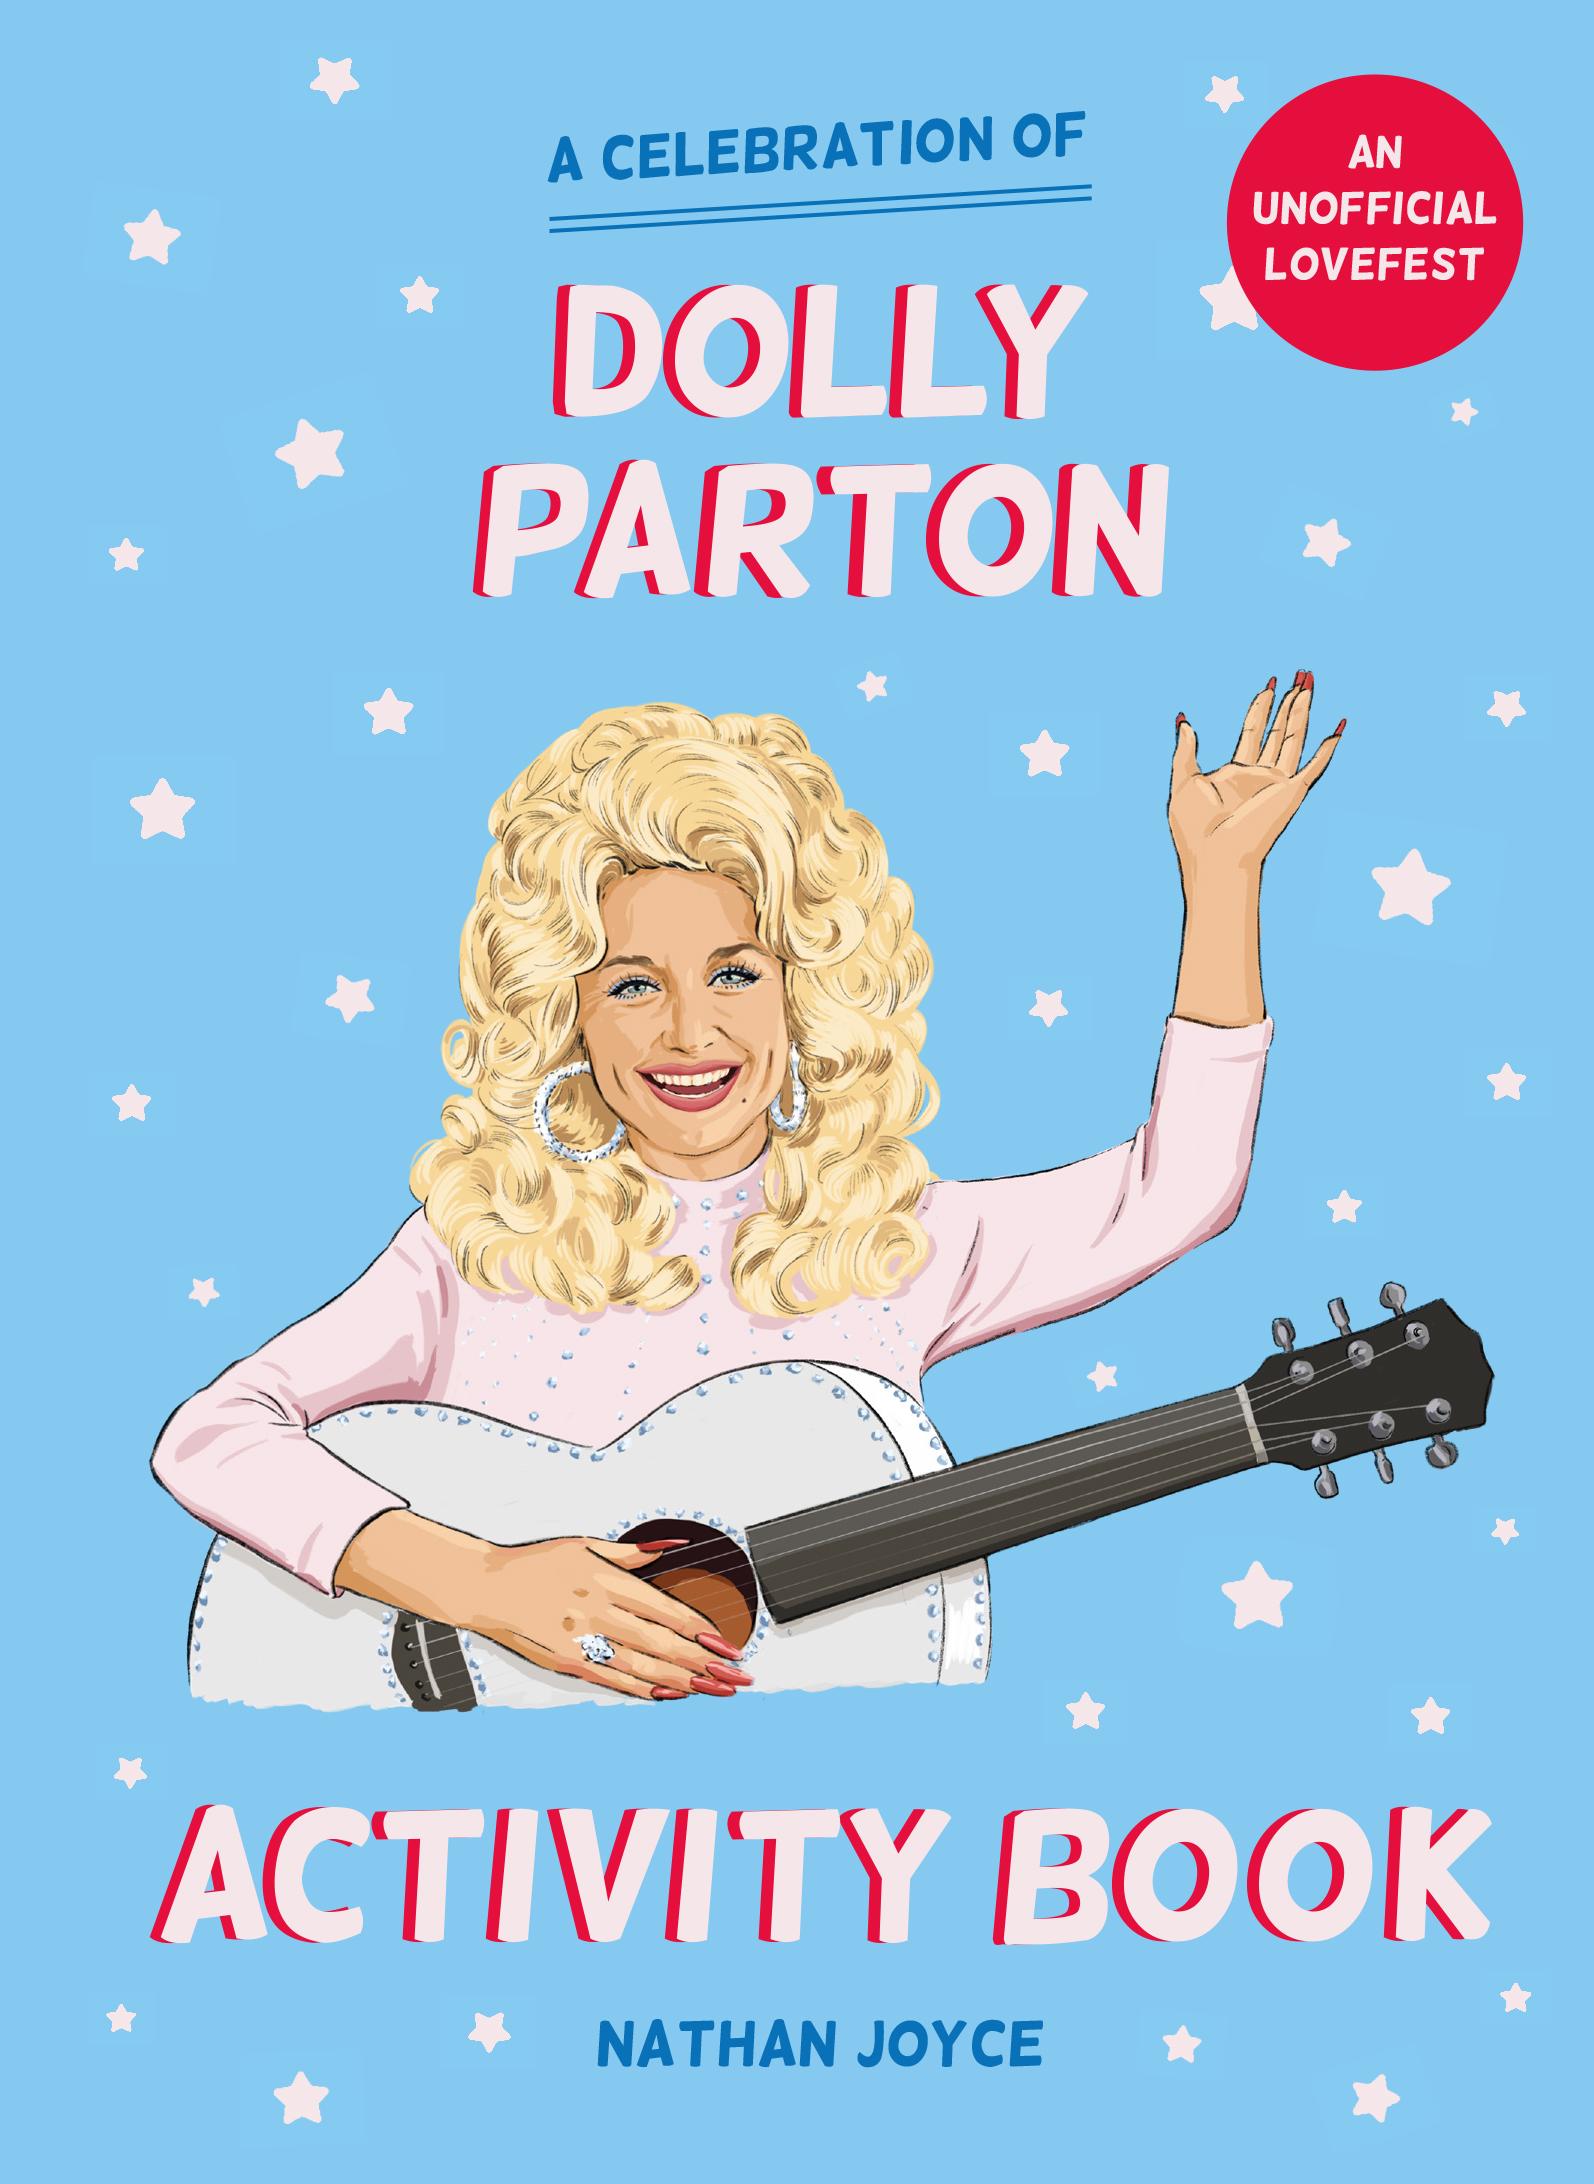 A Celebration of Dolly Parton: The Activity Book